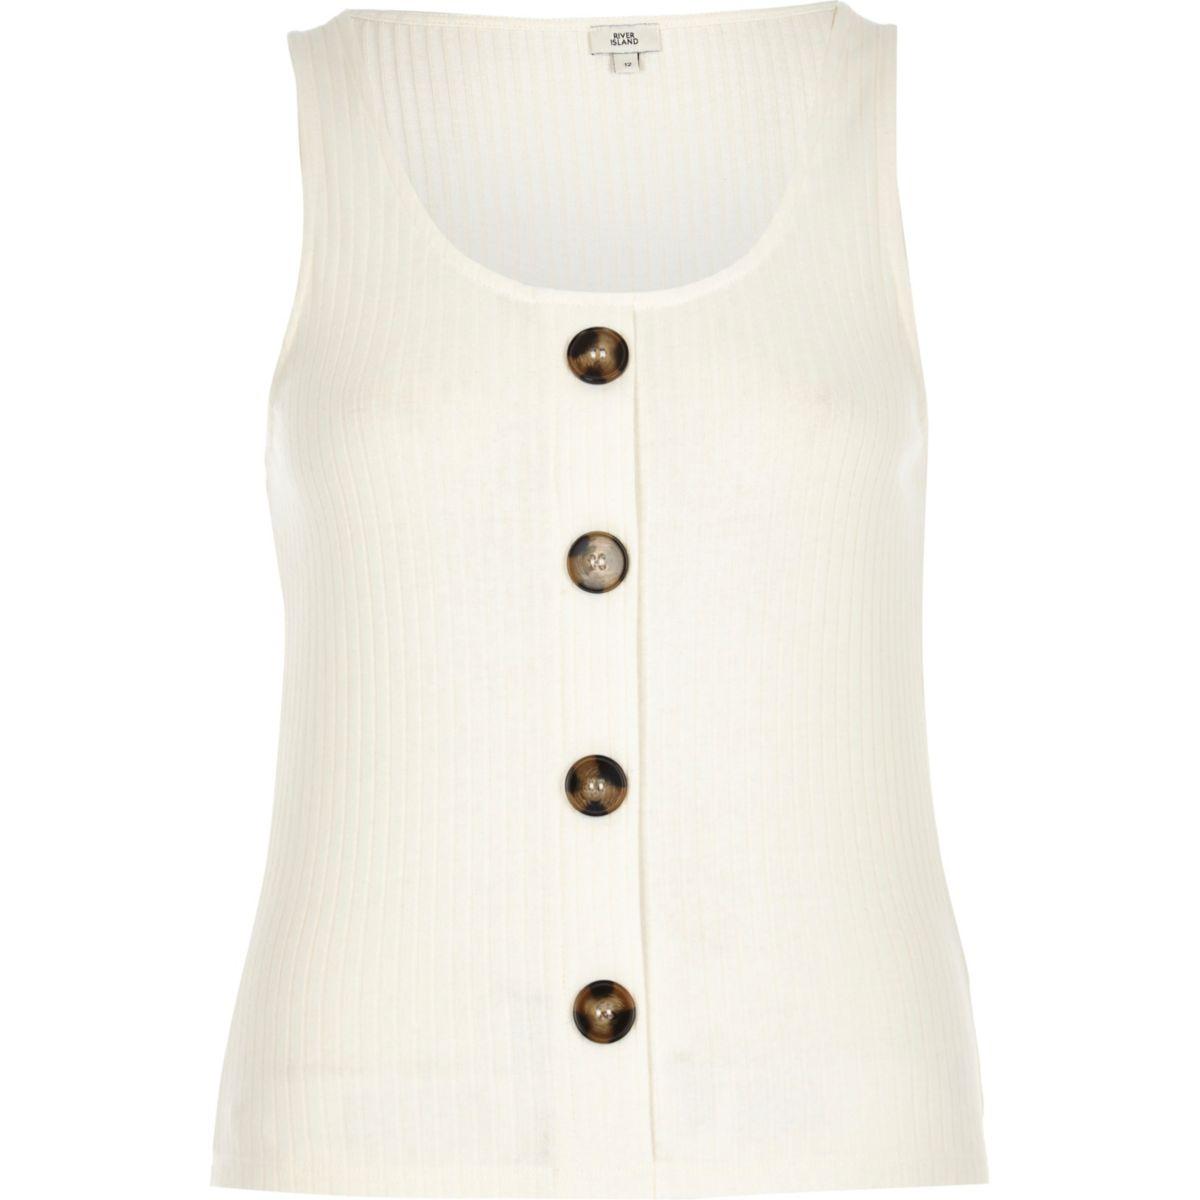 button button front vest button White vest White front White YEtq4w